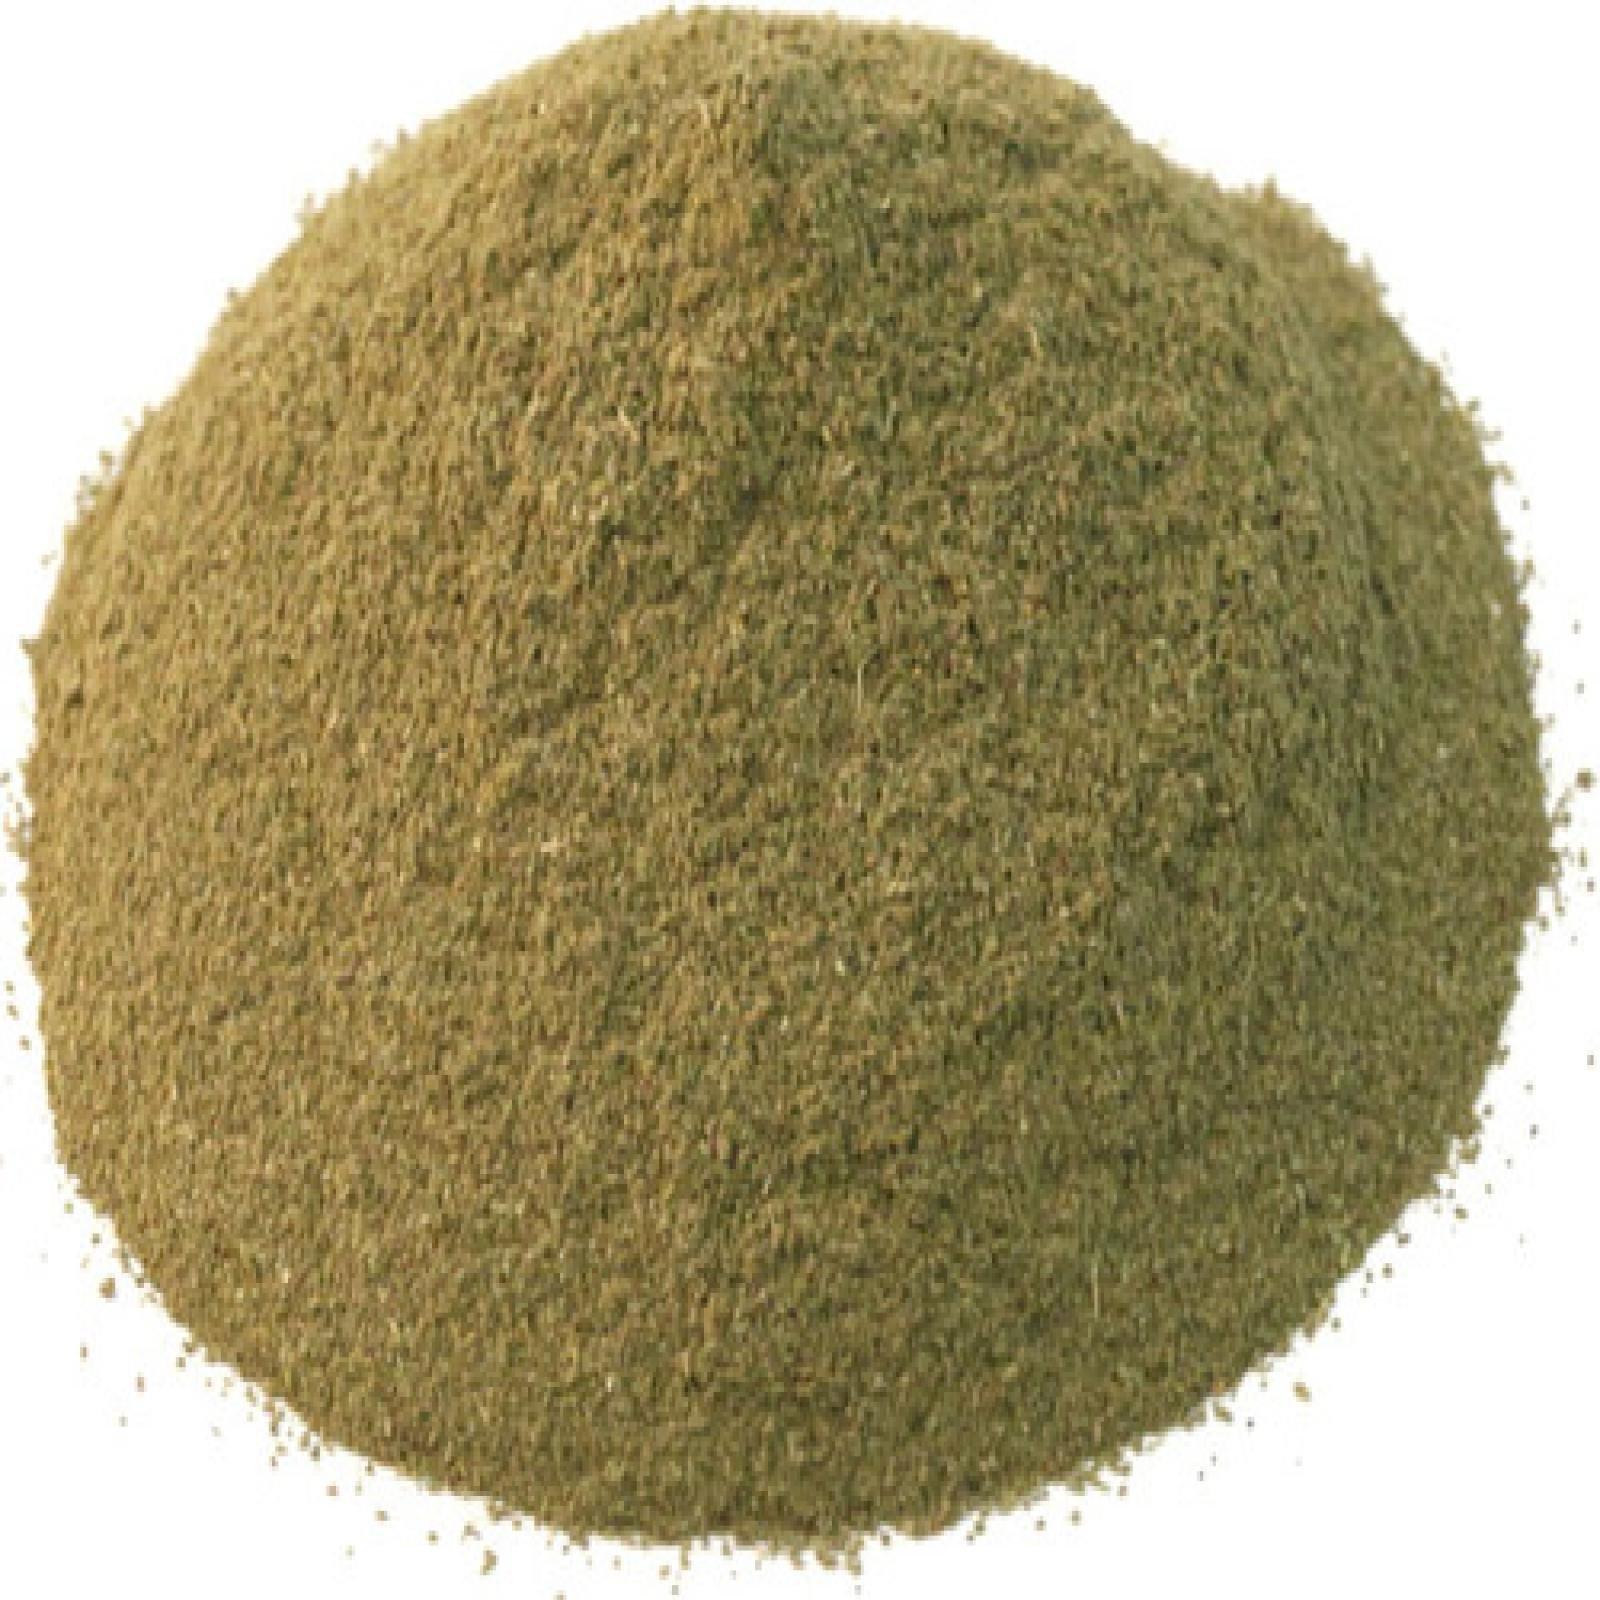 Basil Ground - 5.01 lb by Dylmine Health (Image #1)